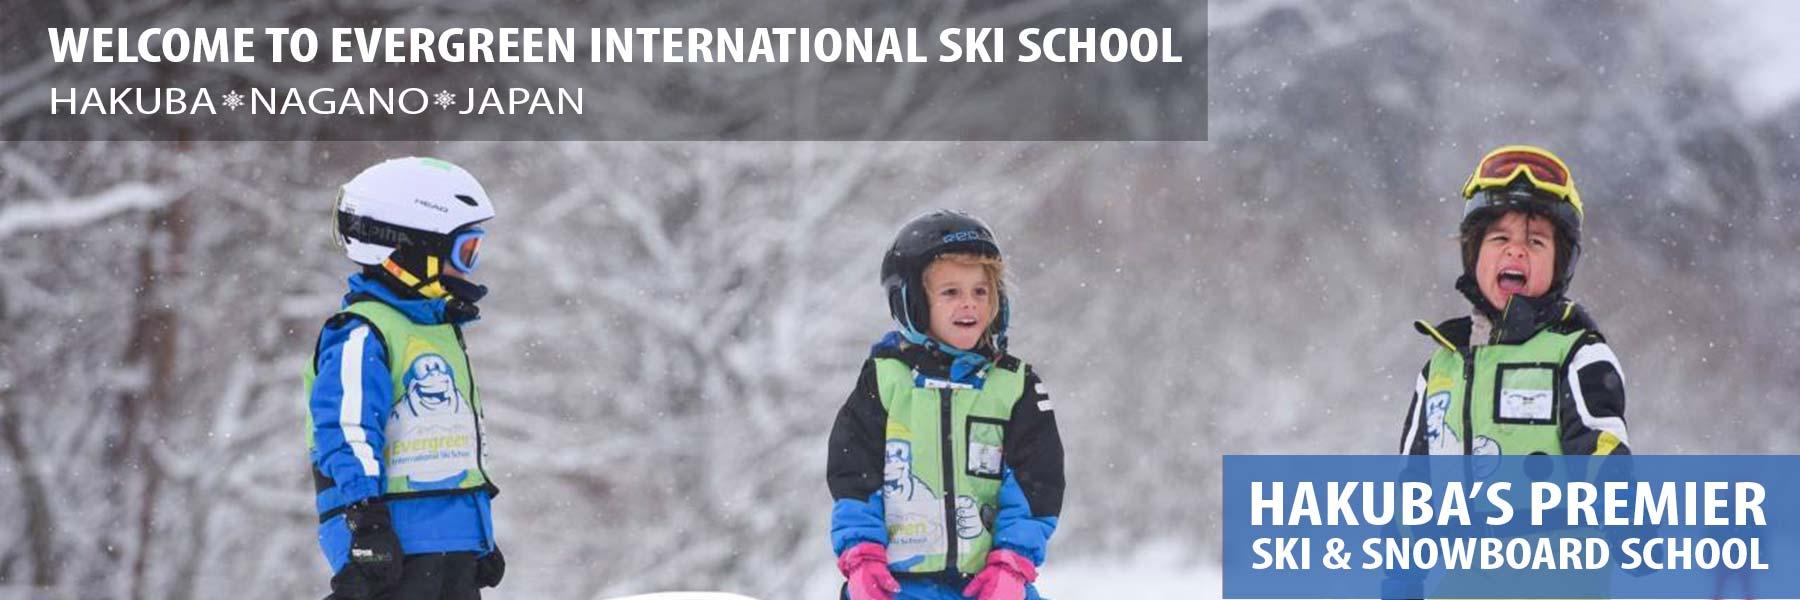 hakuba ski school header - kids lessons